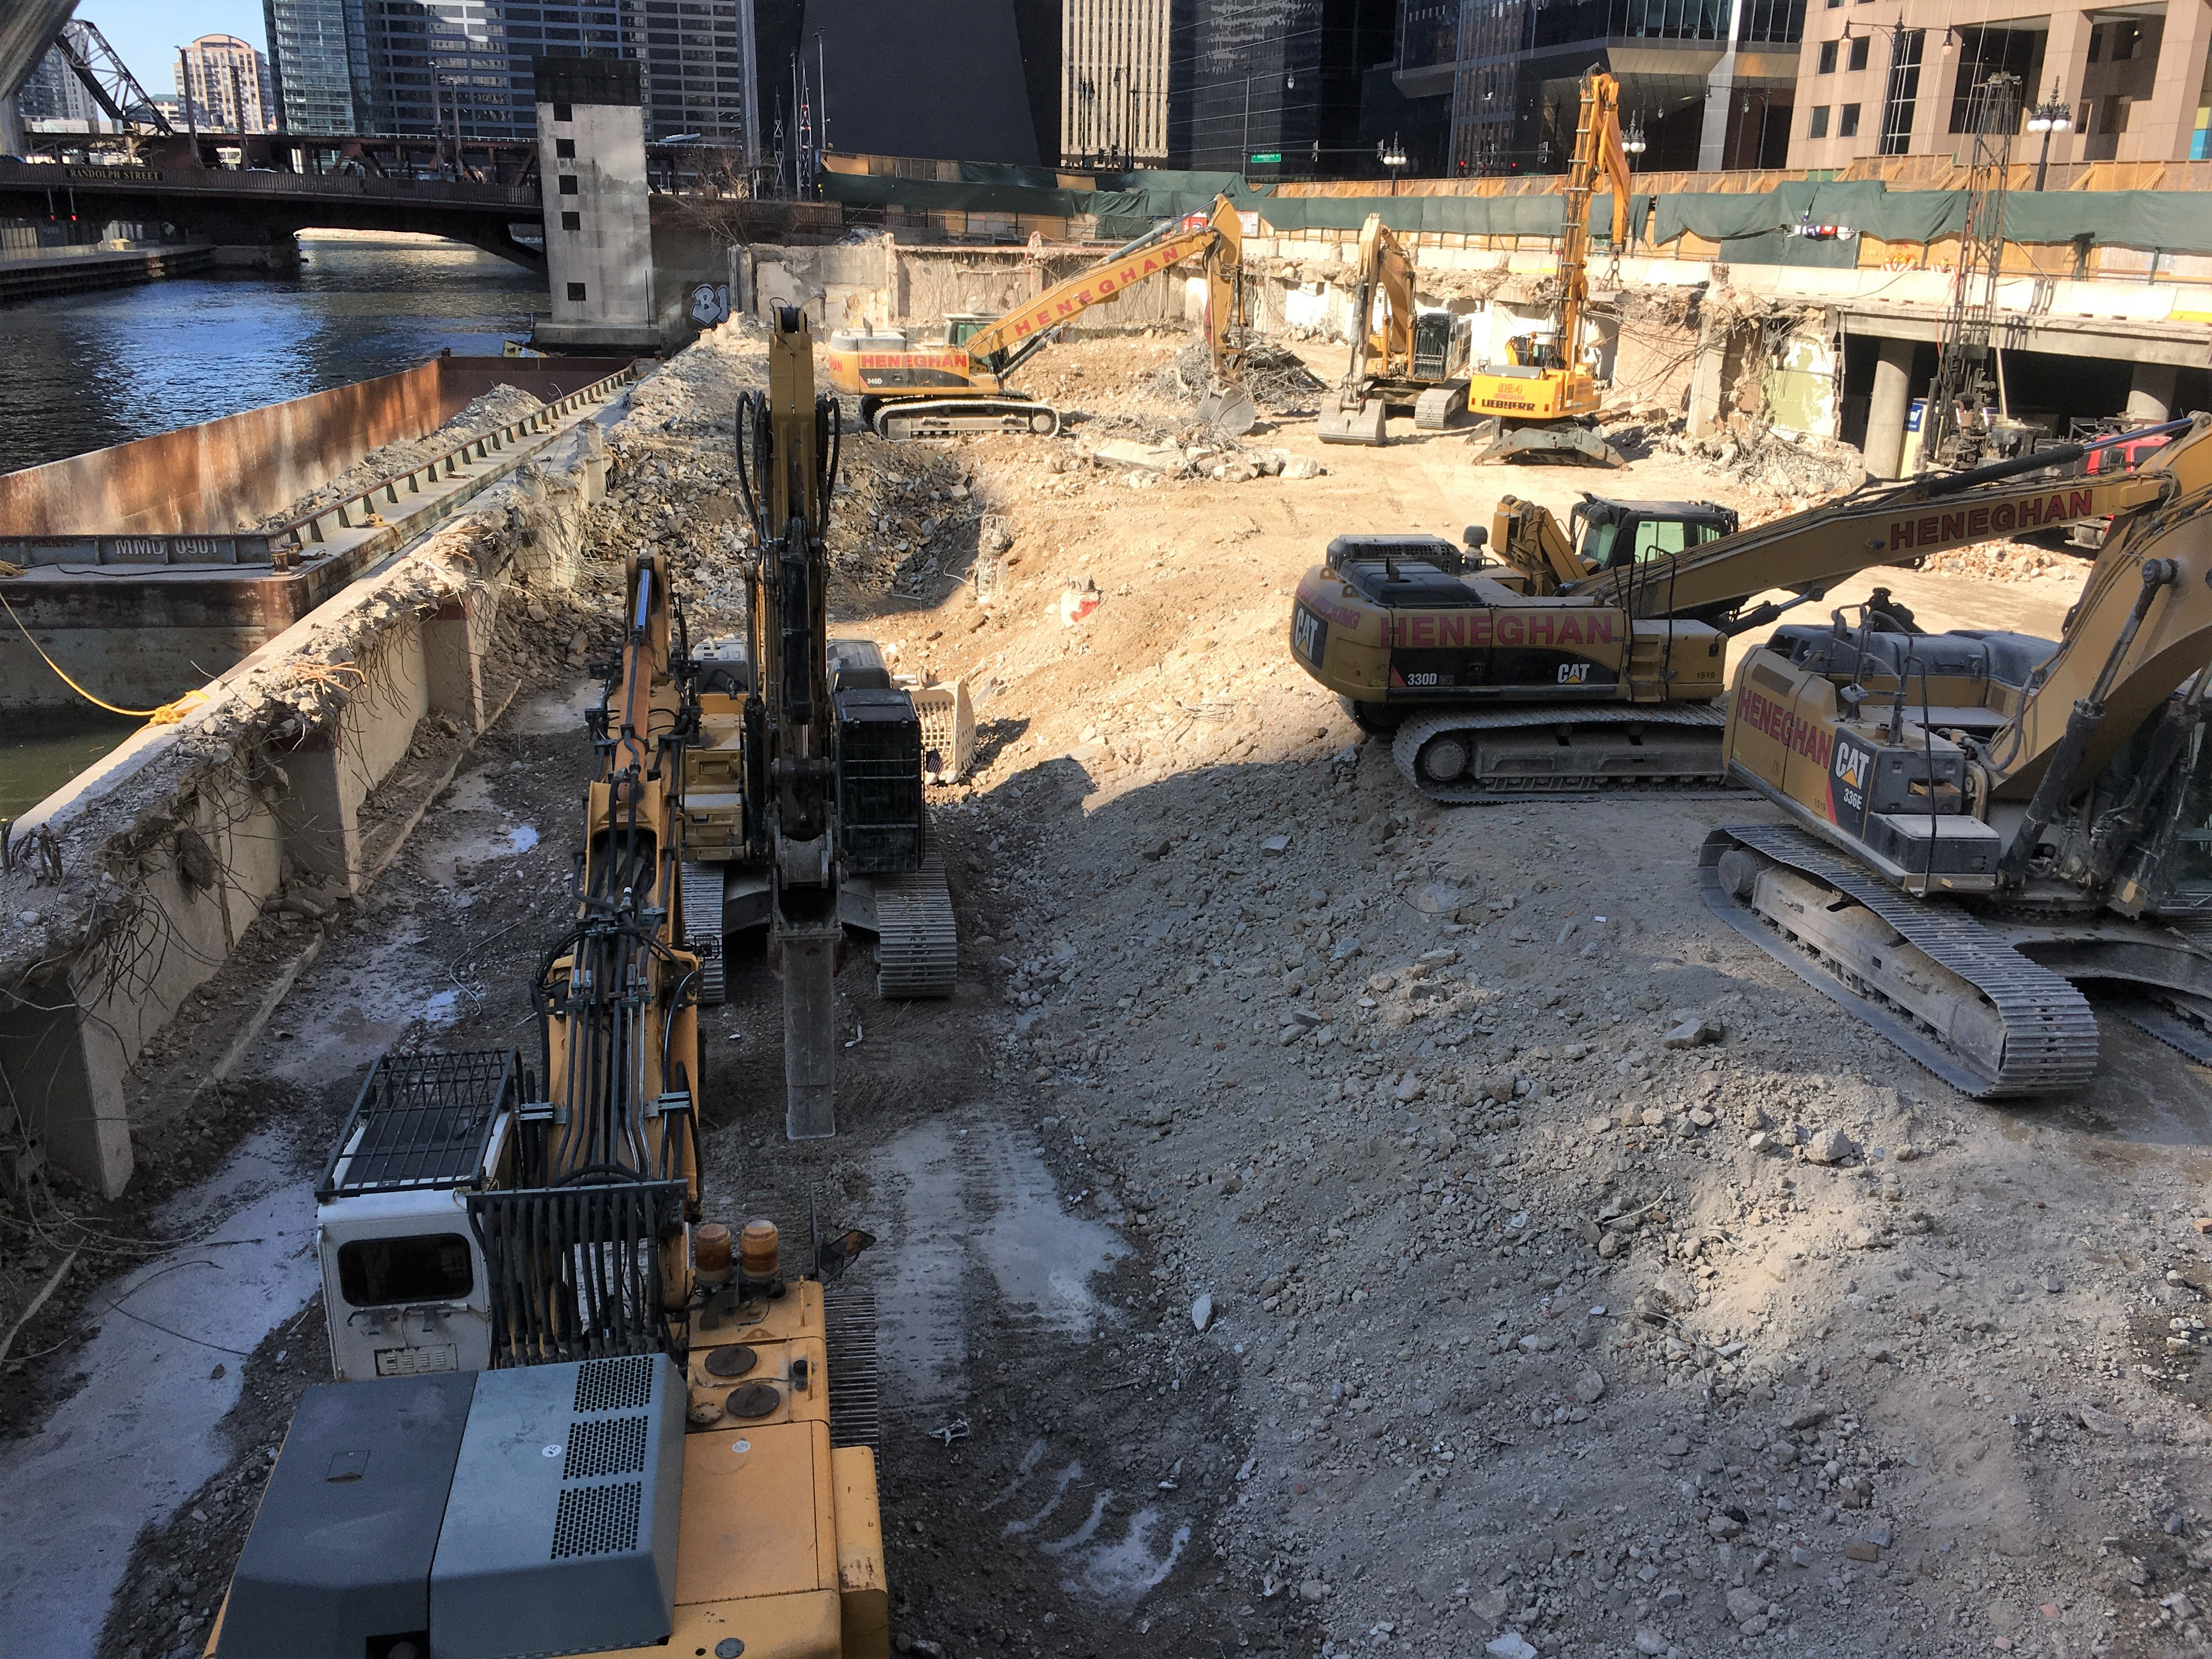 110 North Wacker demolition April 2018